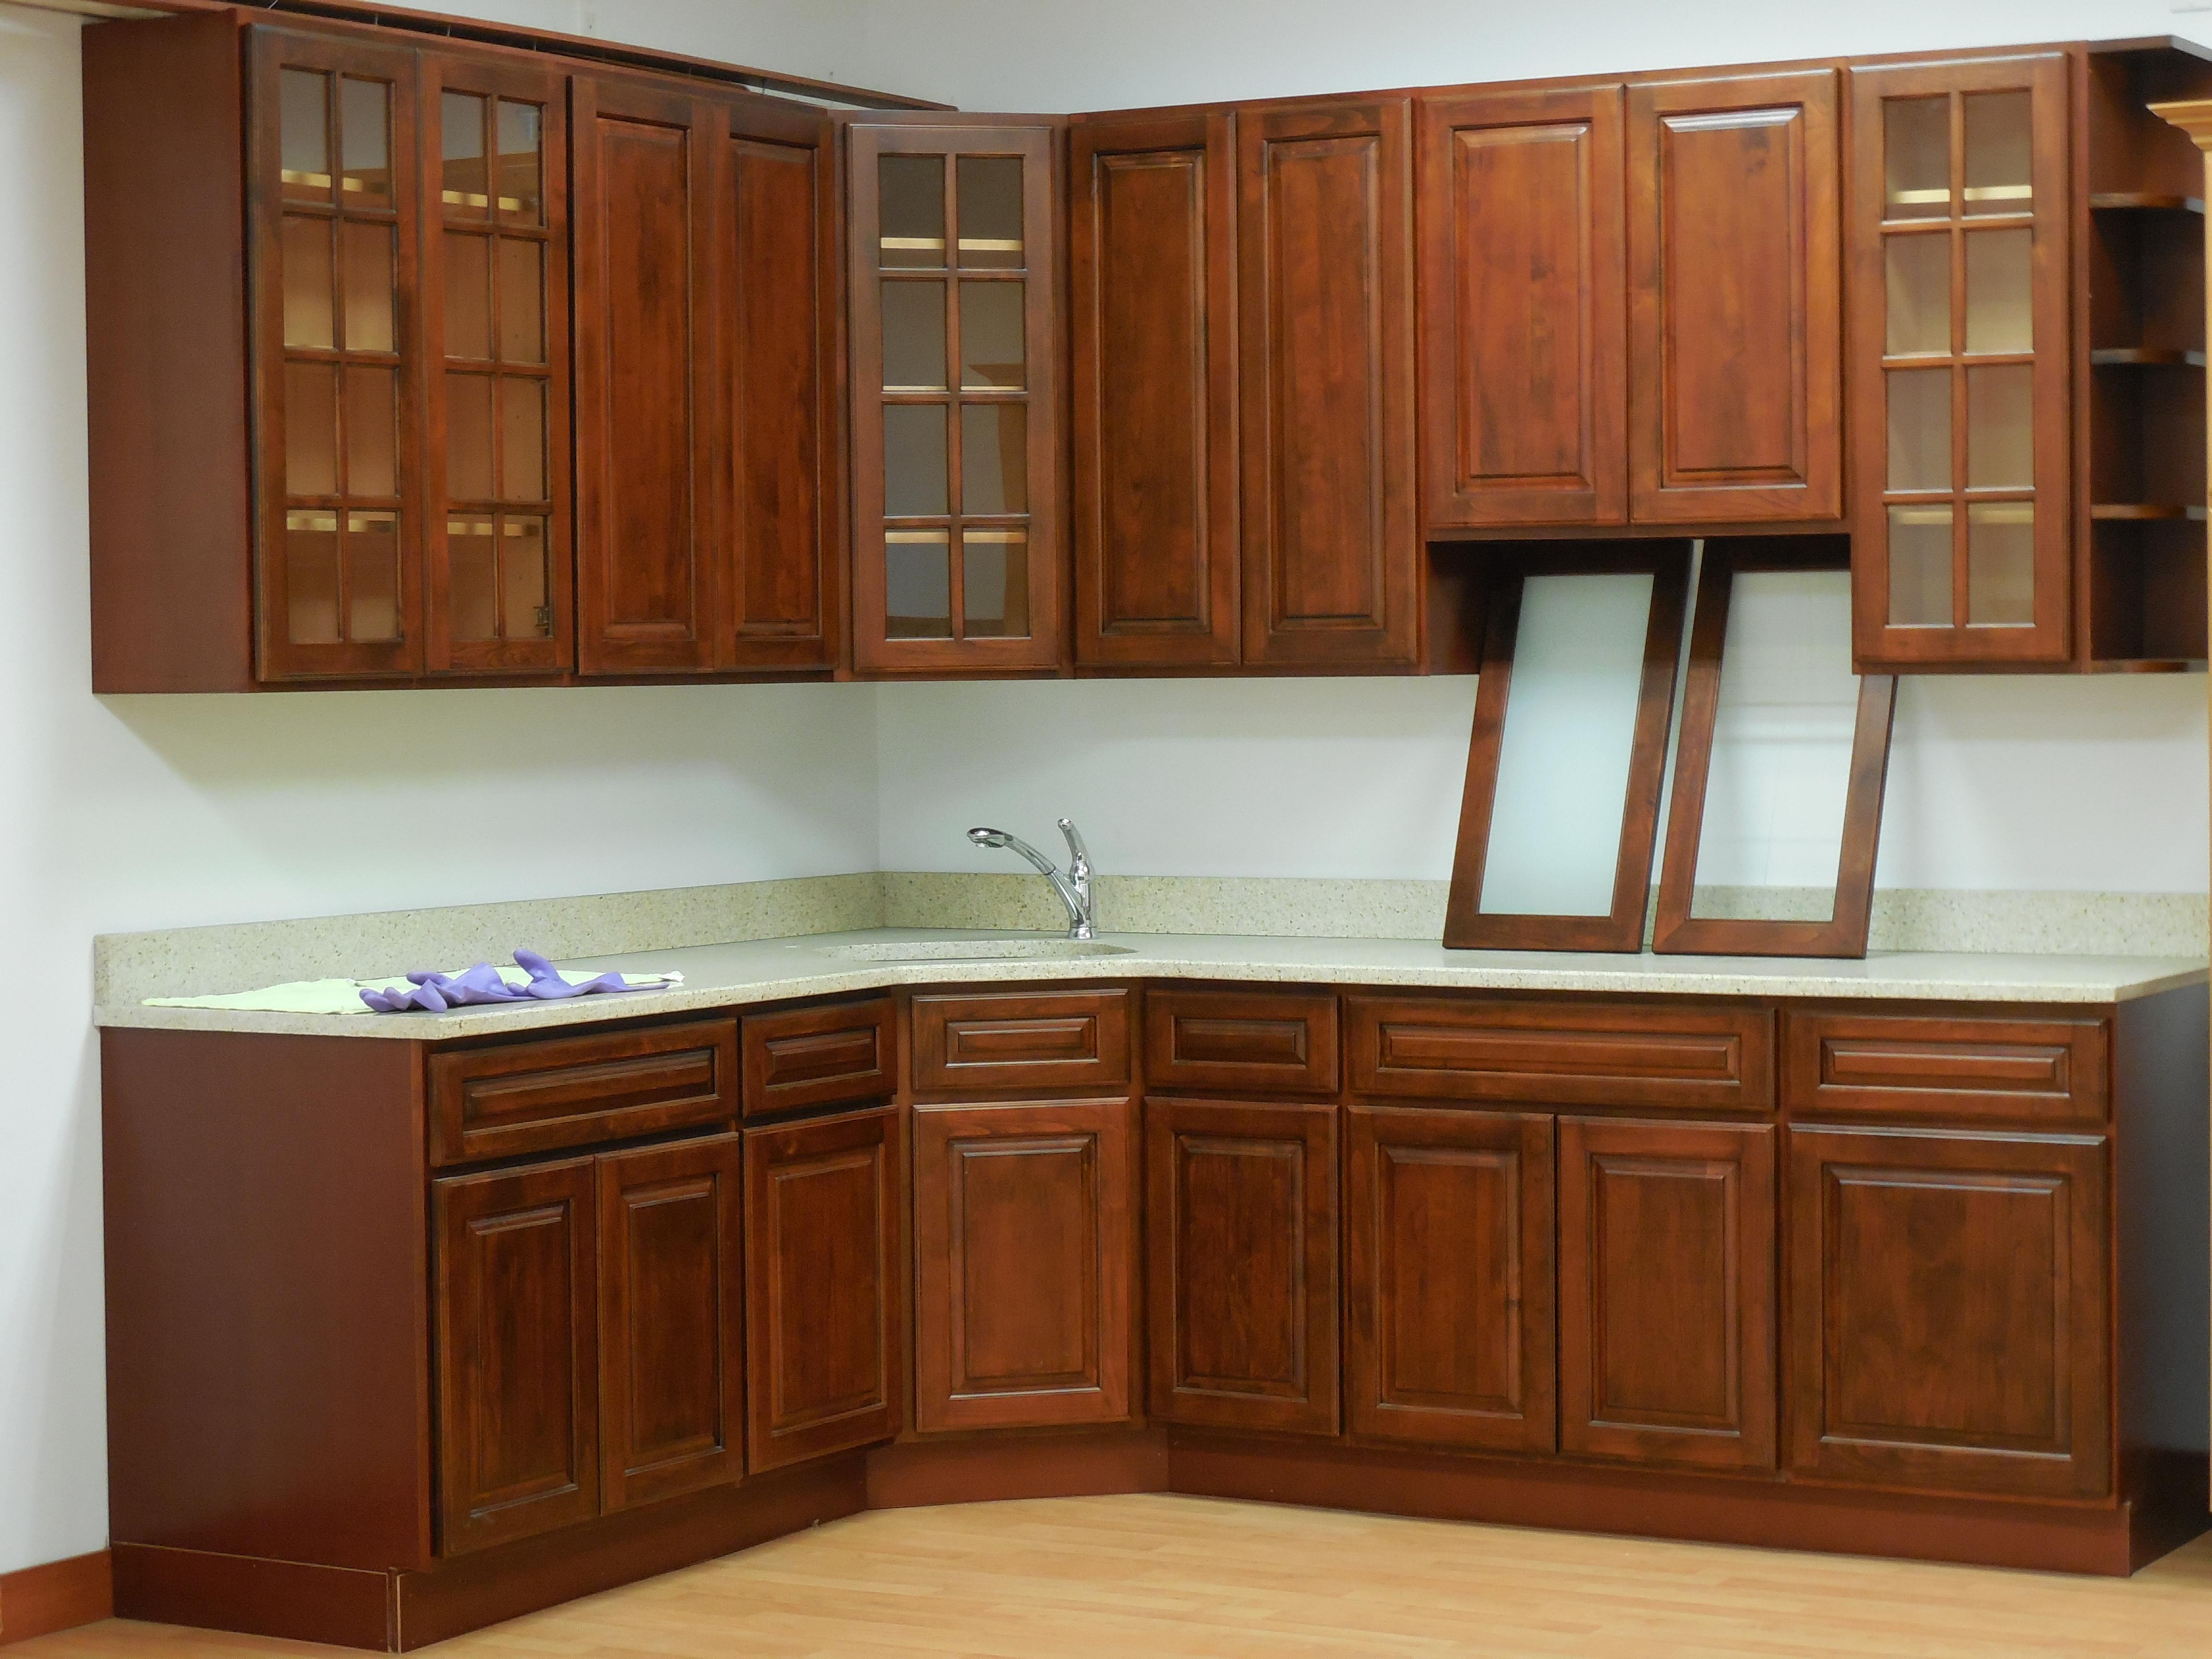 Cnc Kitchen Cabinet Files